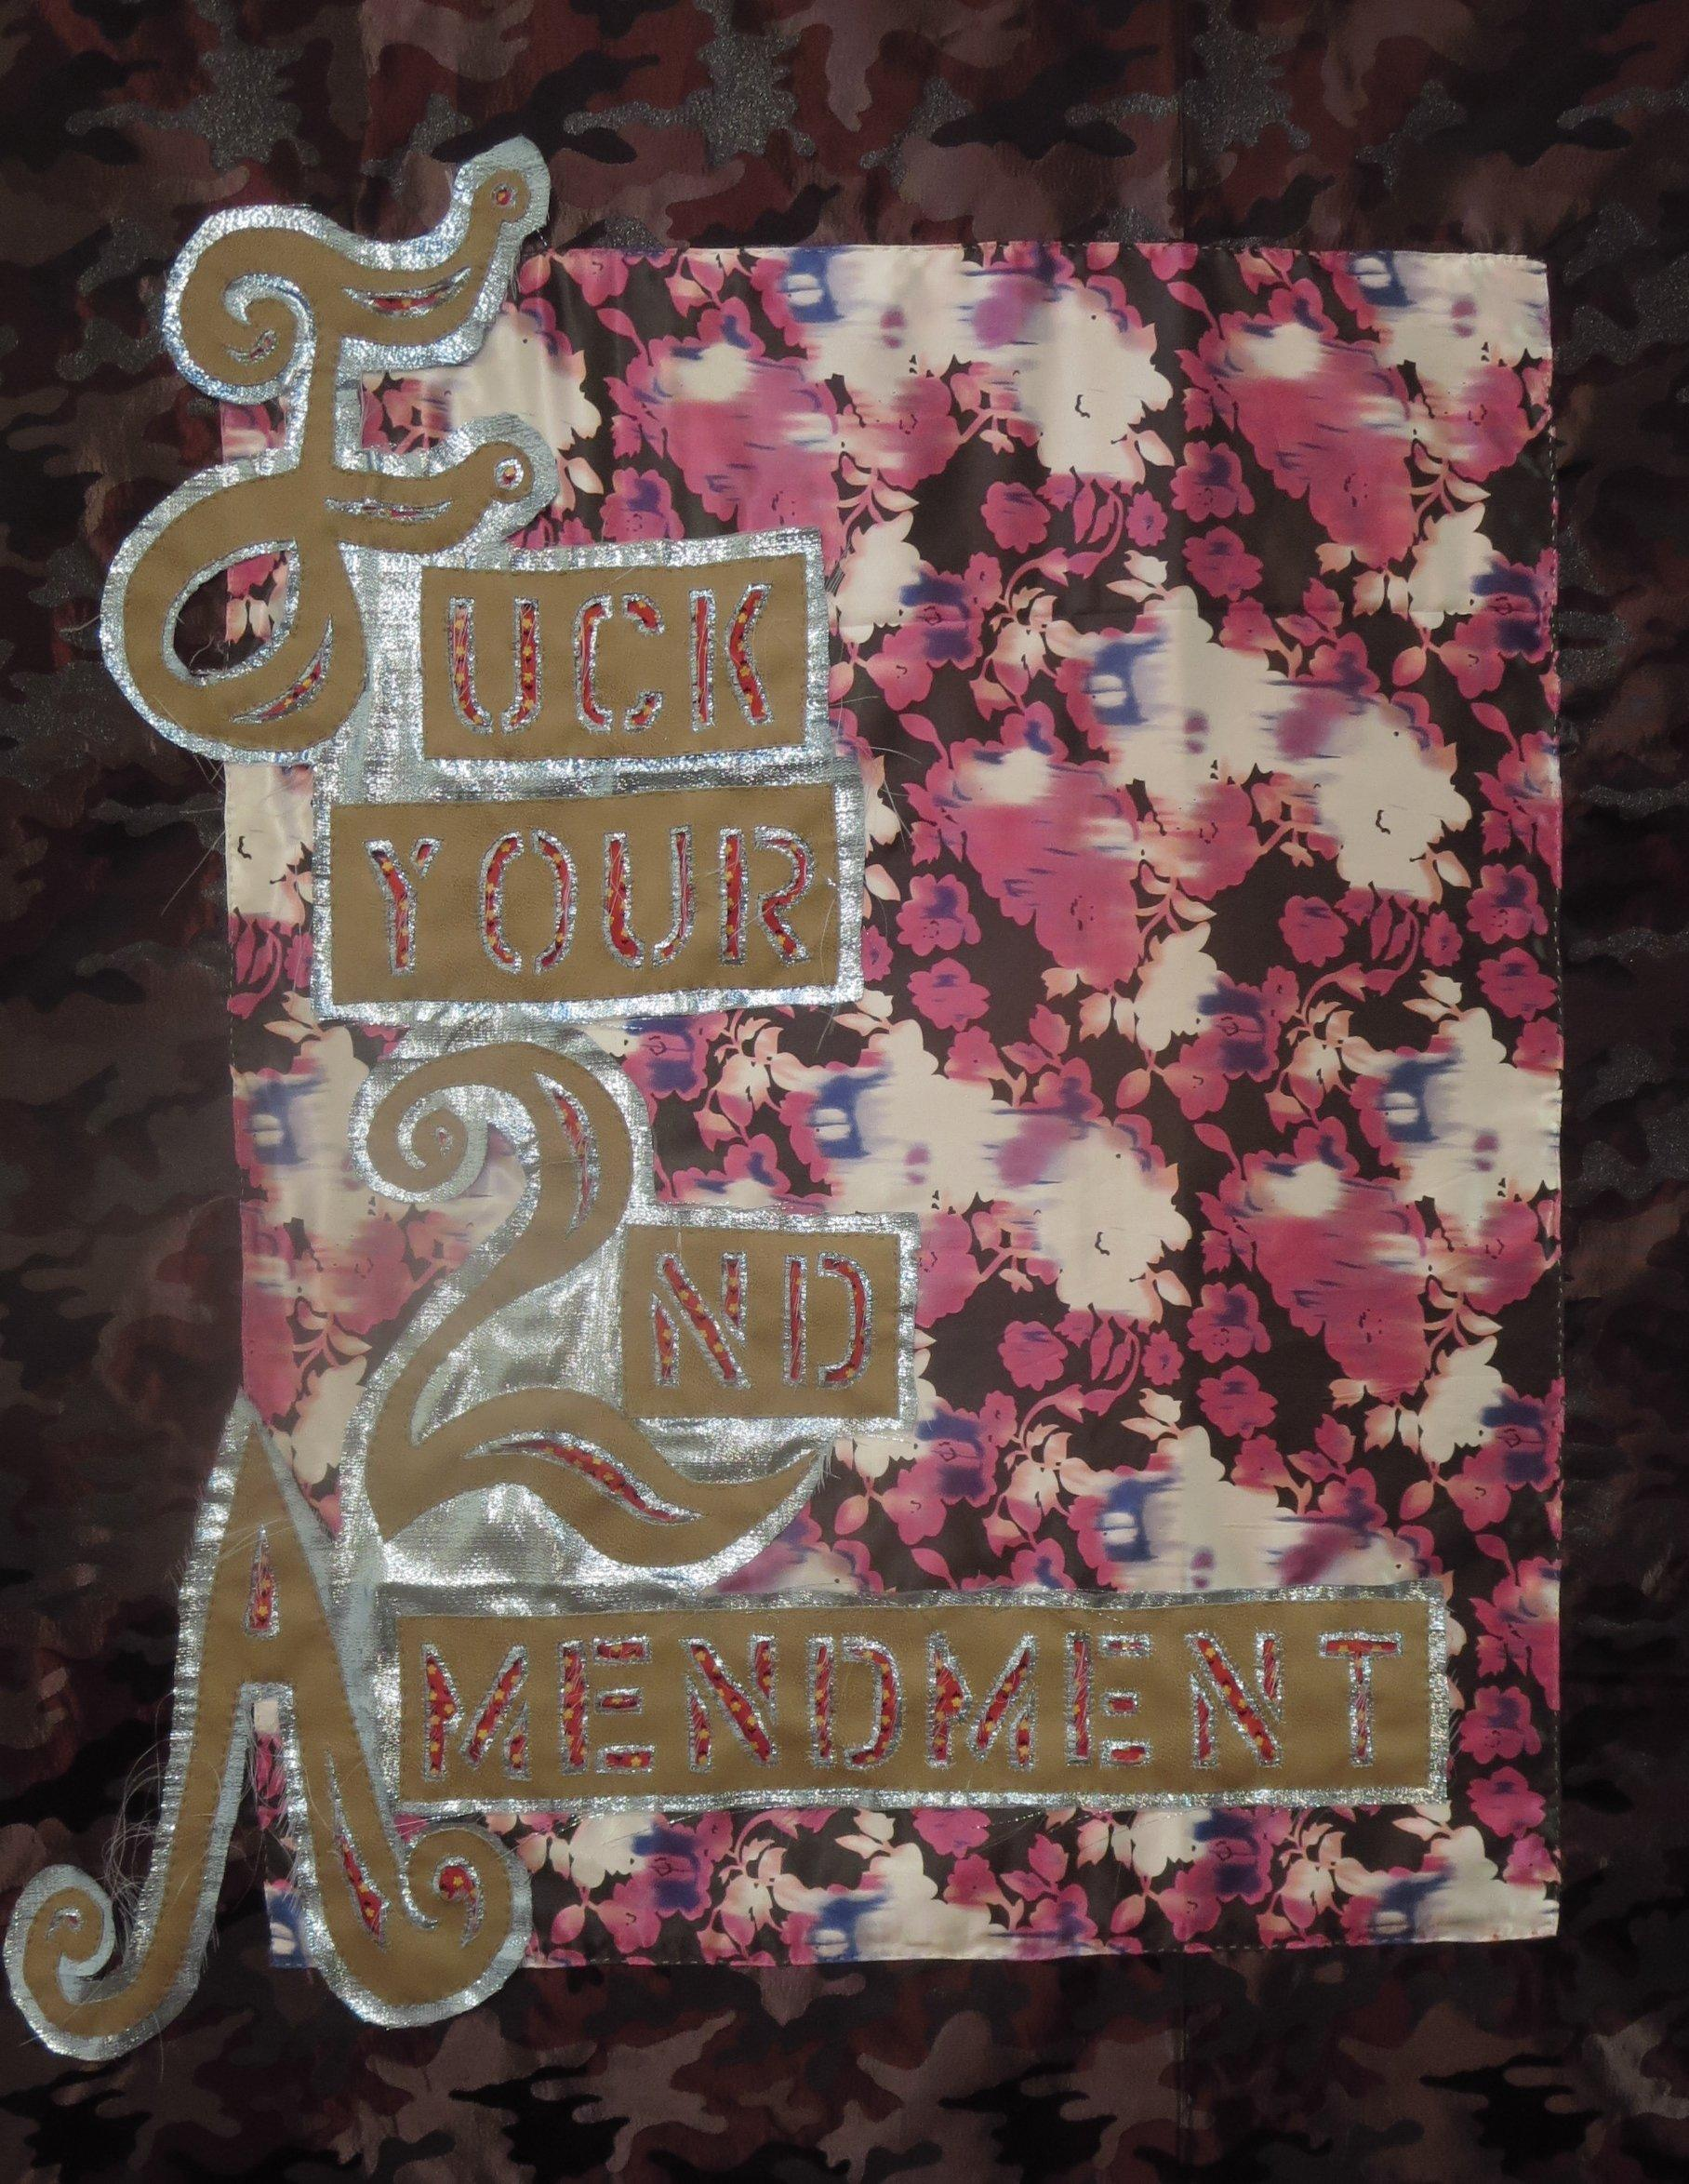 Rita Valley, Fuck Your Second Amendment, 2019, fabric, banner, 58 x 45 inches